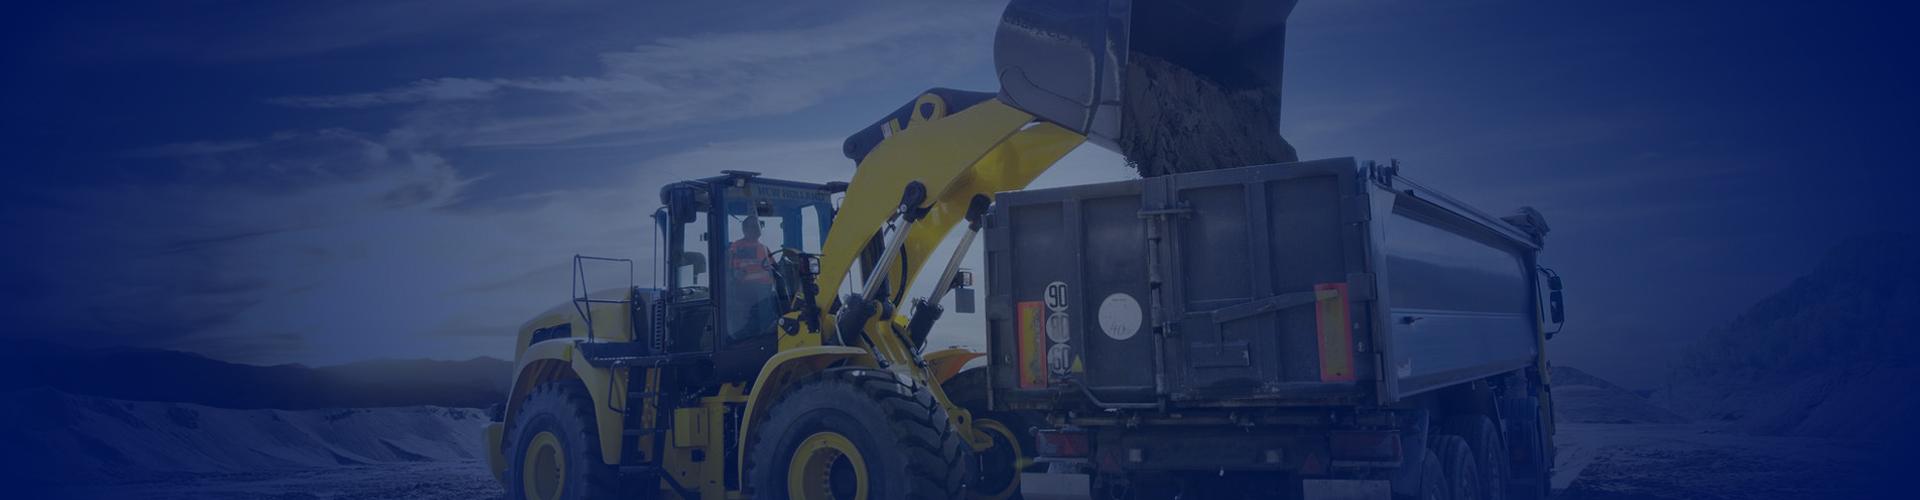 Excise Duty Refund, Heavy Machinery | Tecnocompany